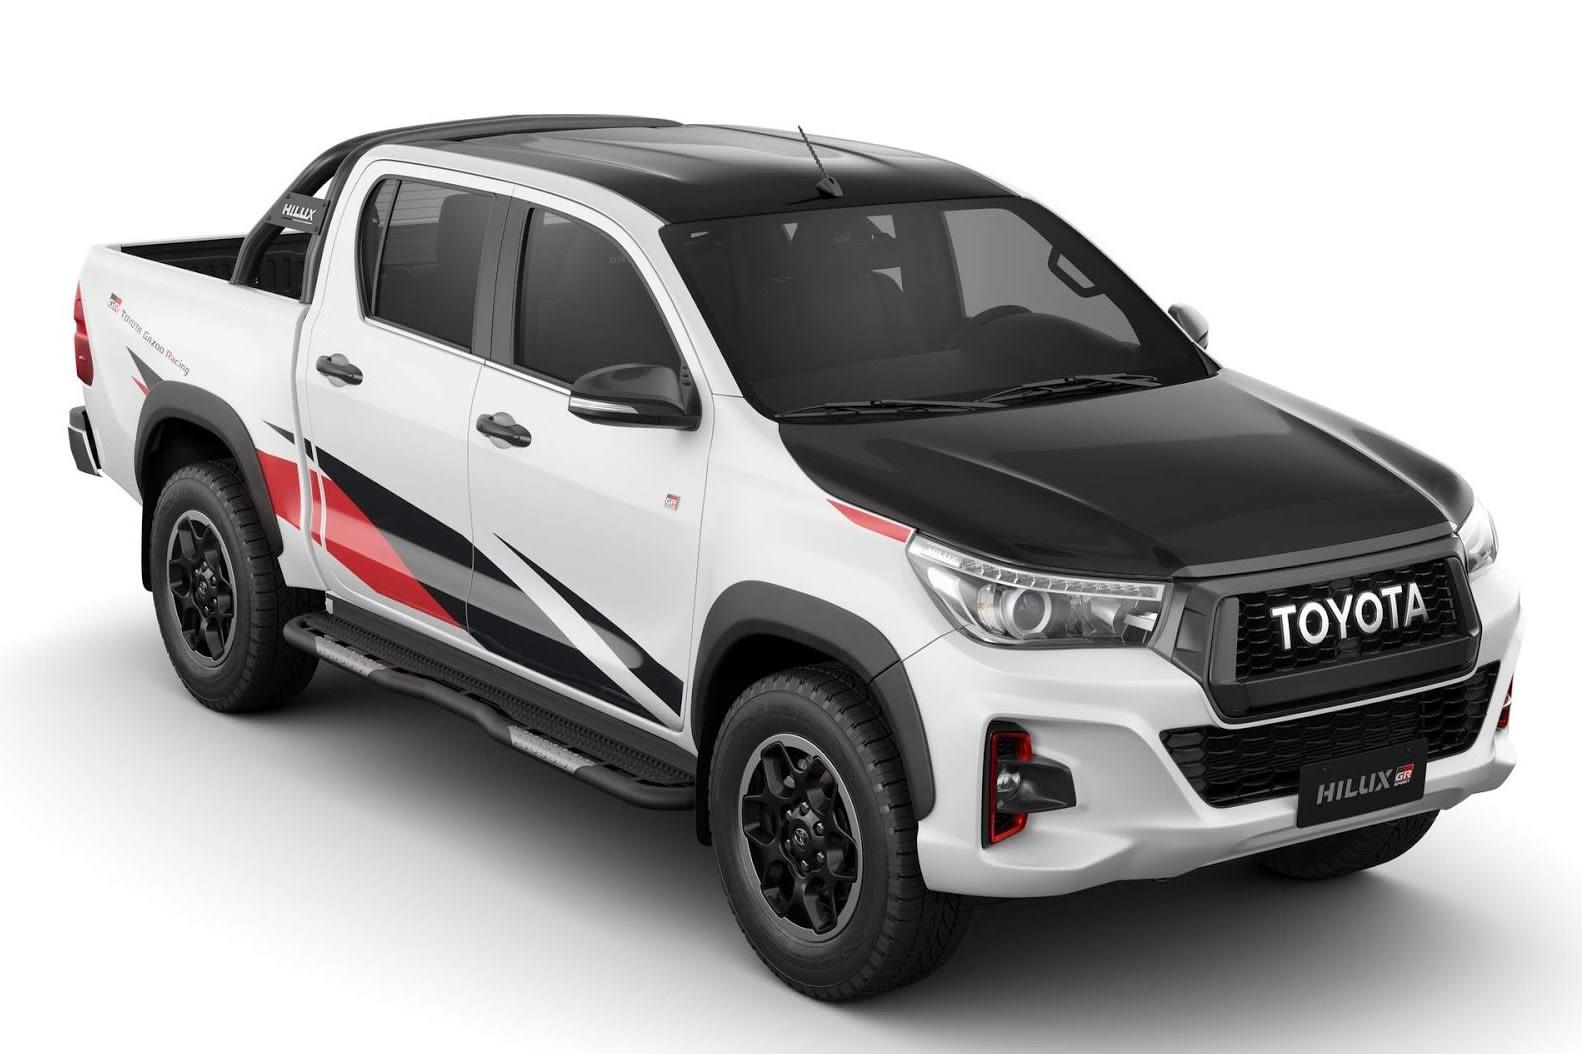 Toyota HiLux GR performance model on Australian wish list